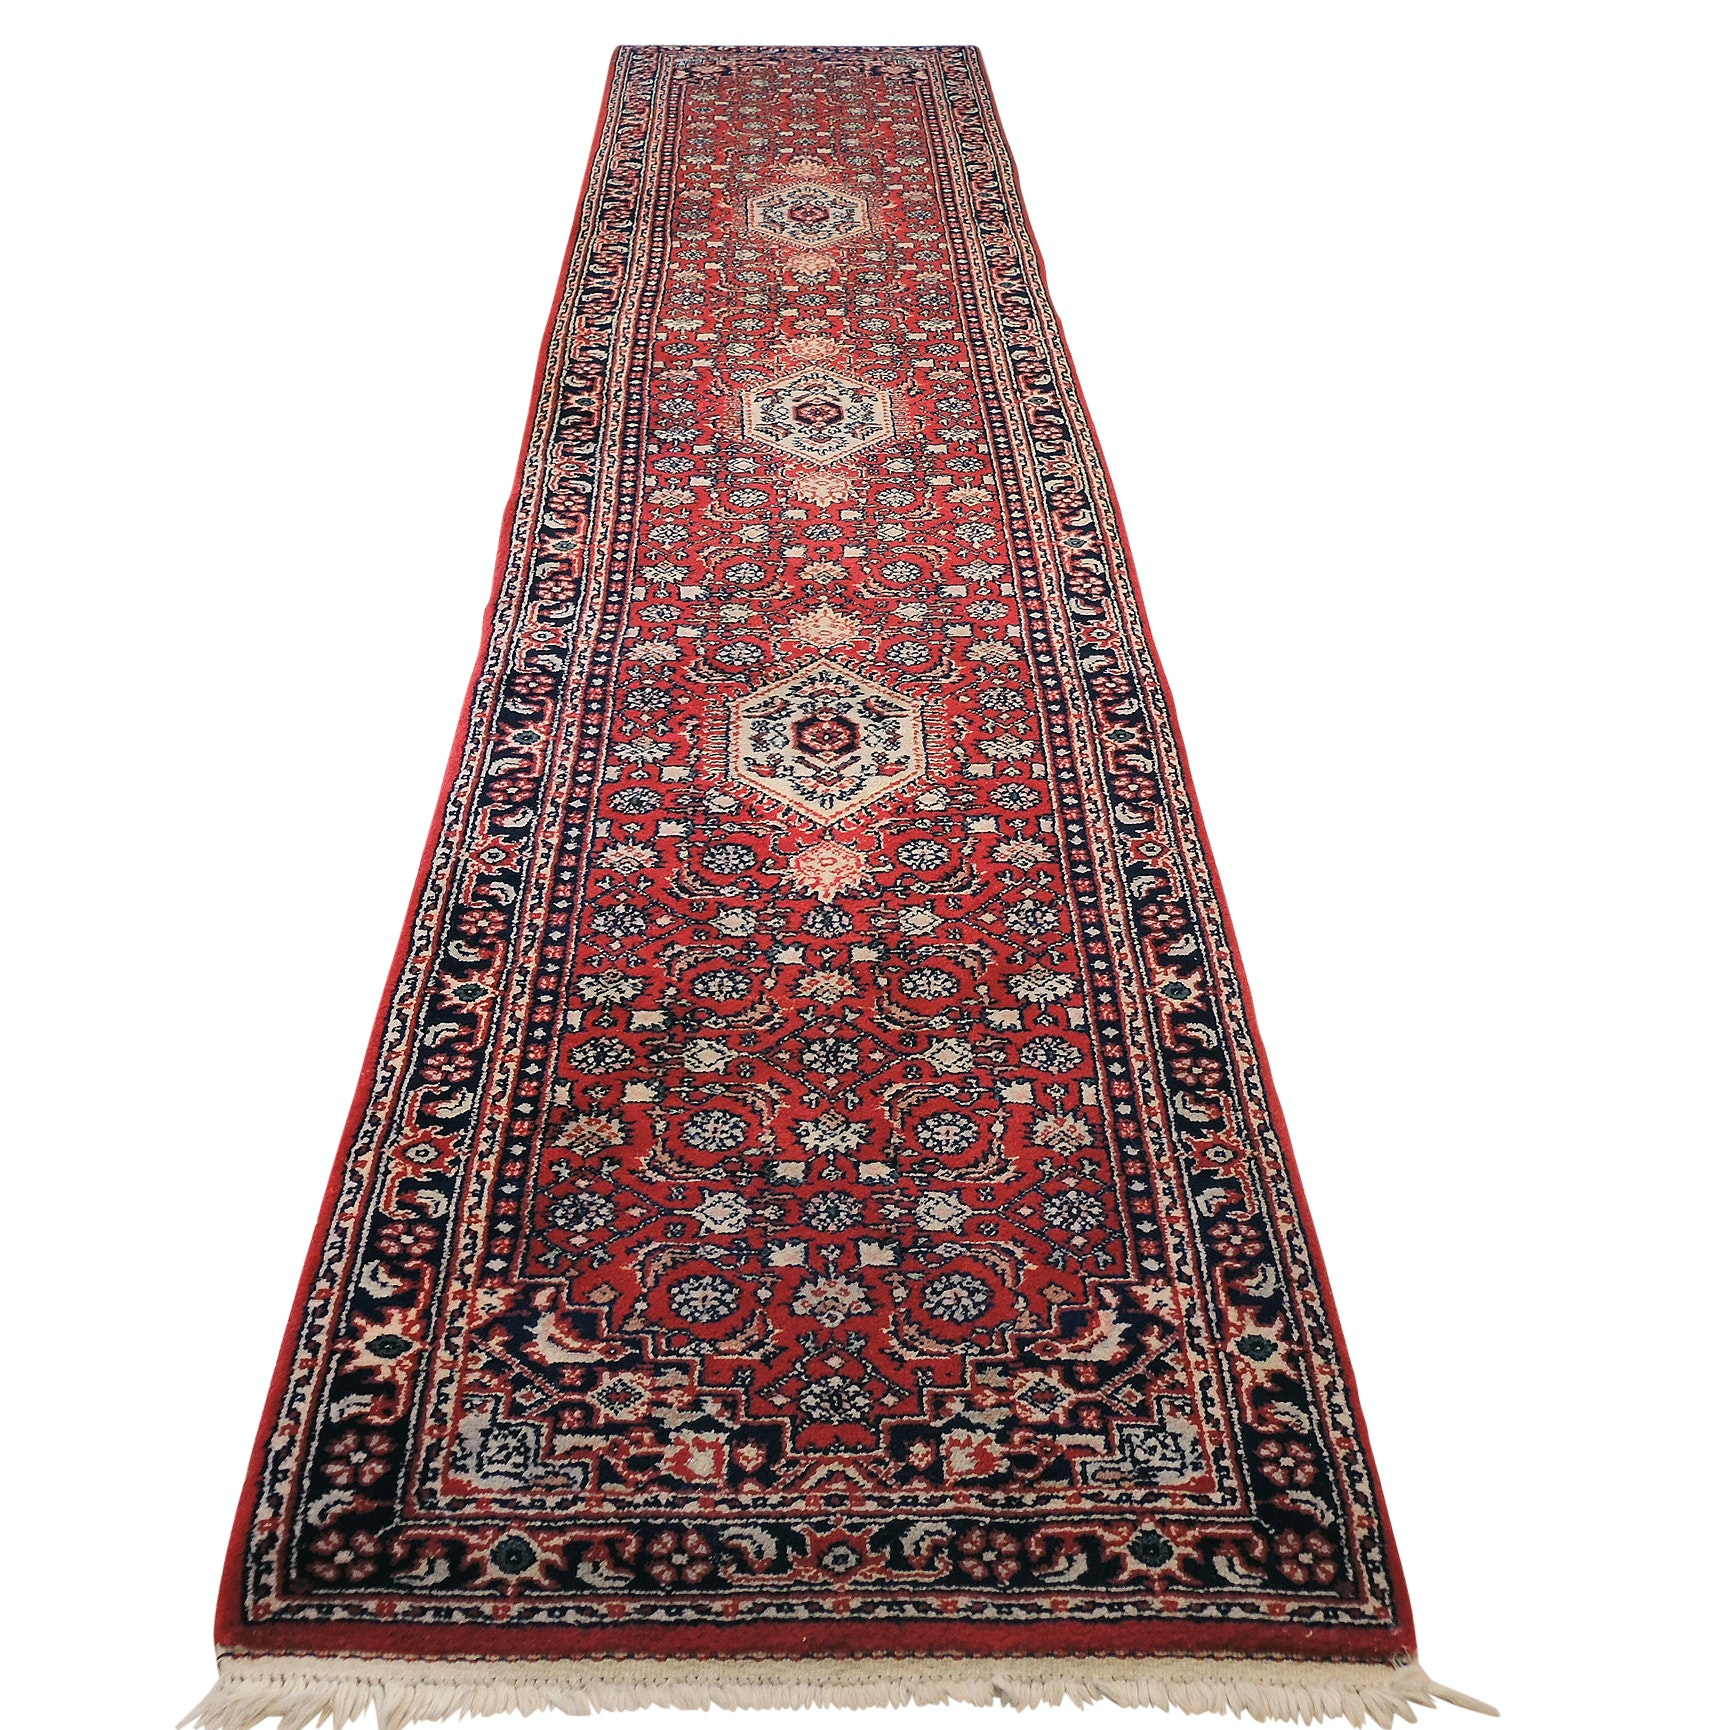 Hand-Knotted Indo-Persian Bijar Carpet Runner